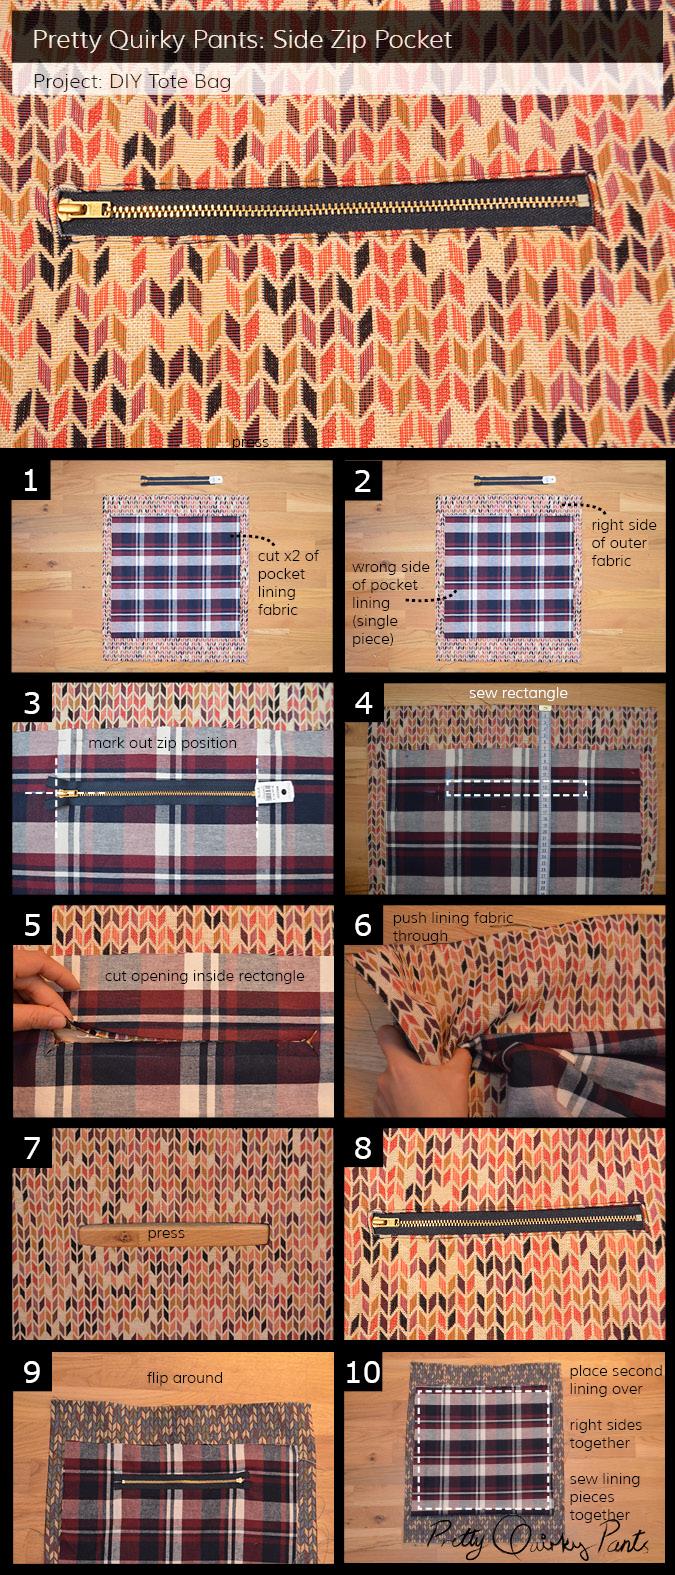 Instruction Layout - tote bag zipper pocket